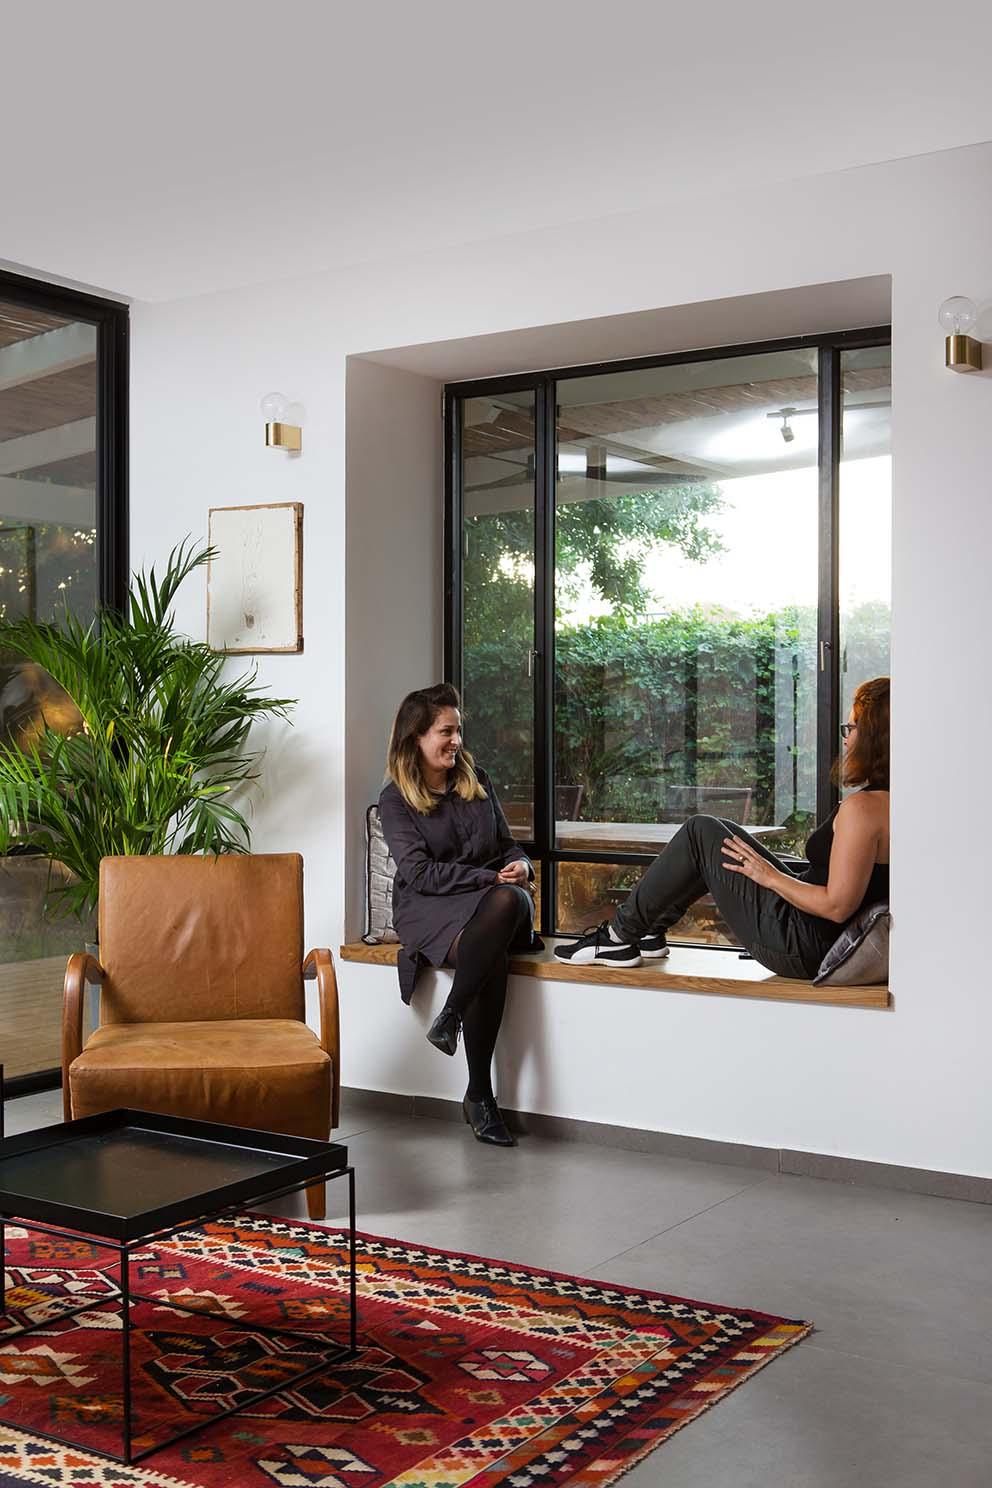 עיצוב: סטודיו Details, צילום: שירן כרמל, www.pnim.co.il